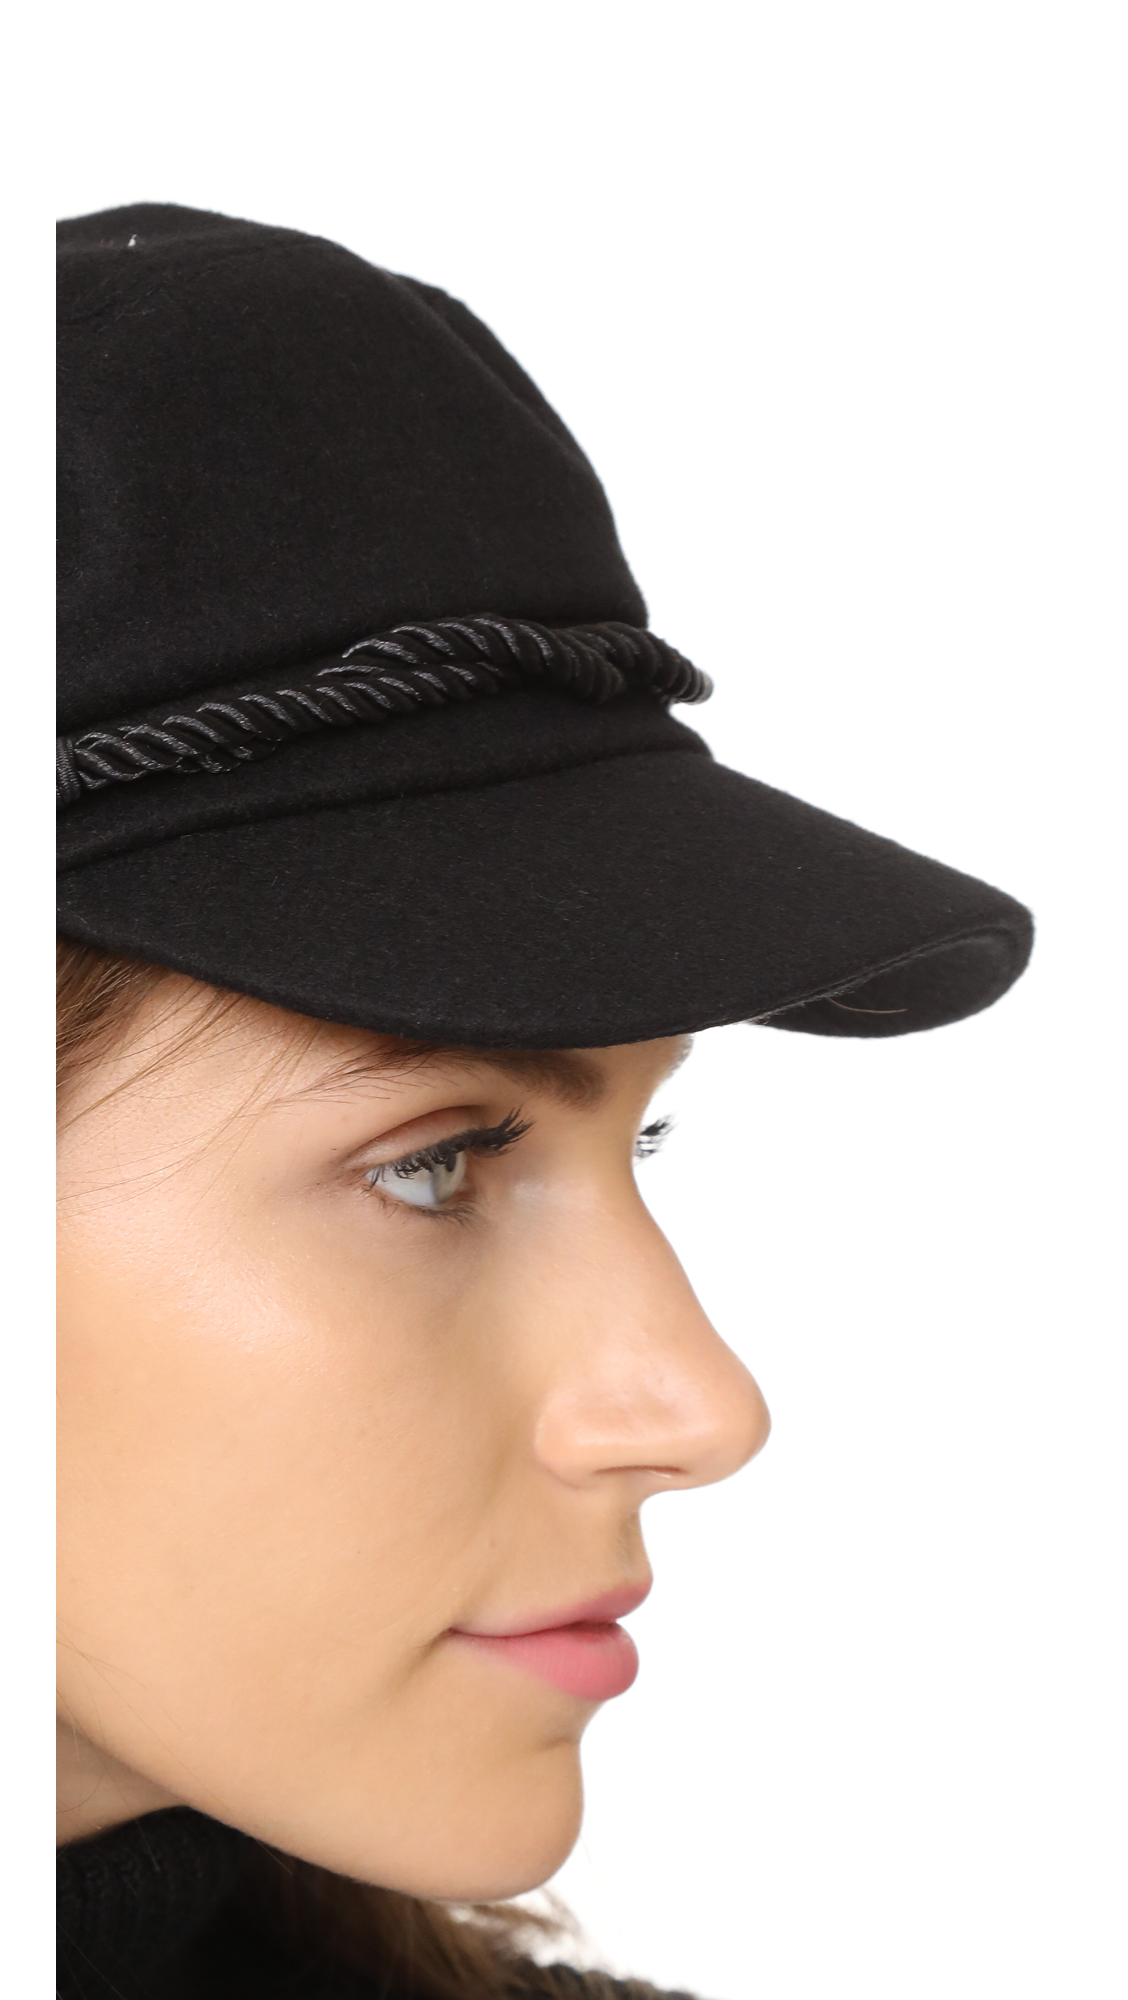 82471b0eeb80e Hat Attack Emmy Wool Cap